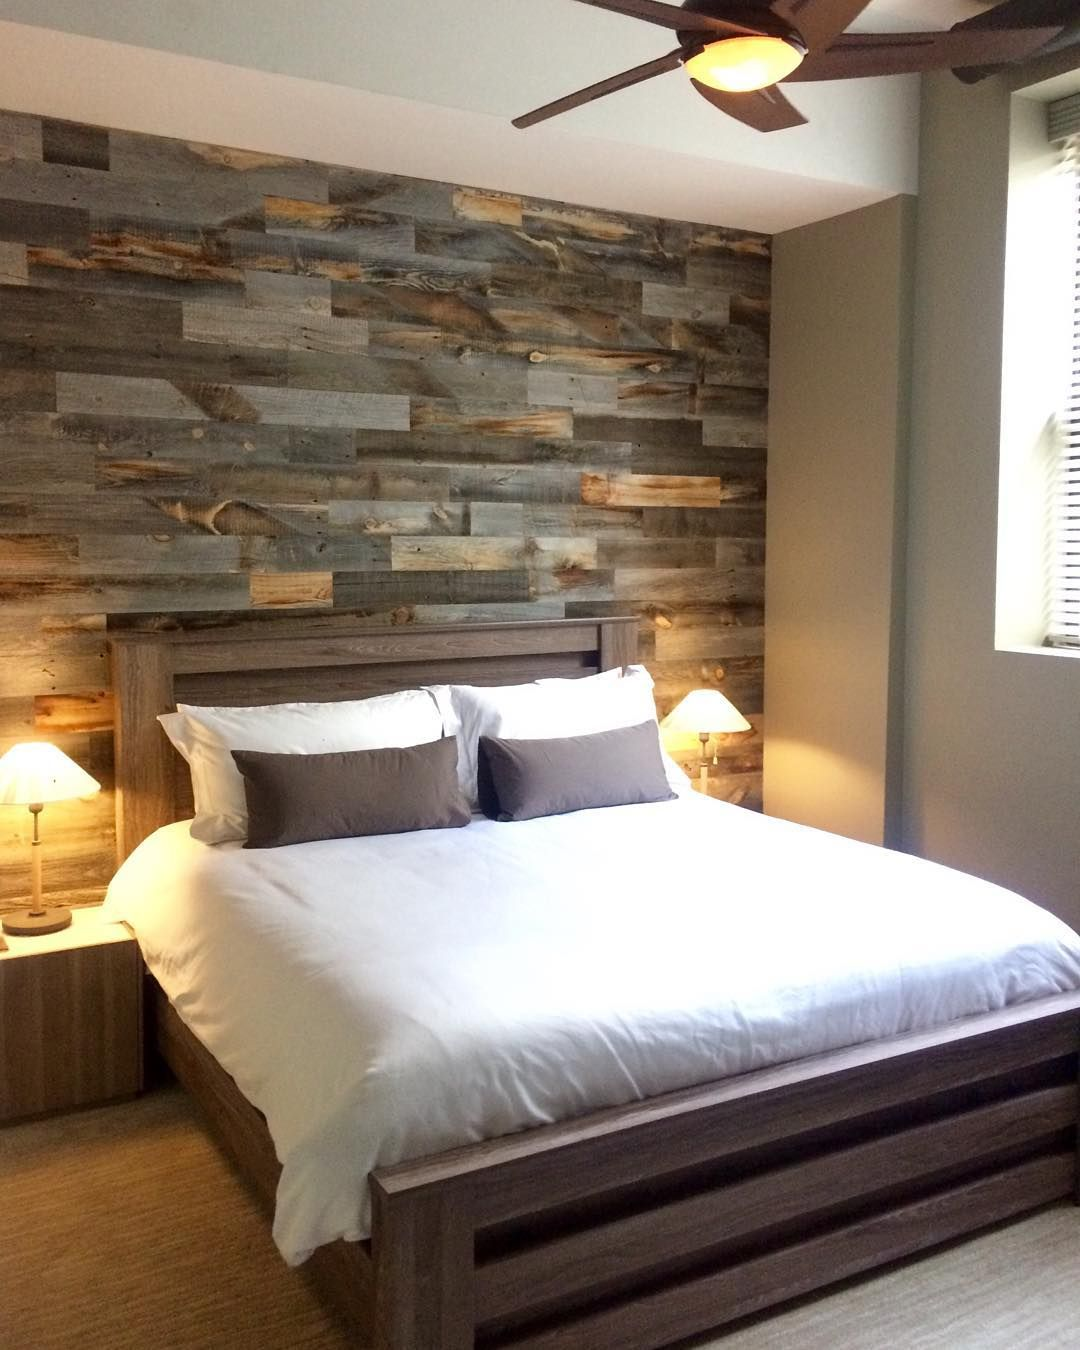 Diy Easy Peel And Stick Wood Wall Decor Remodel Bedroom Bedroom Design Home Decor Bedroom Wooden bedroom wall decor